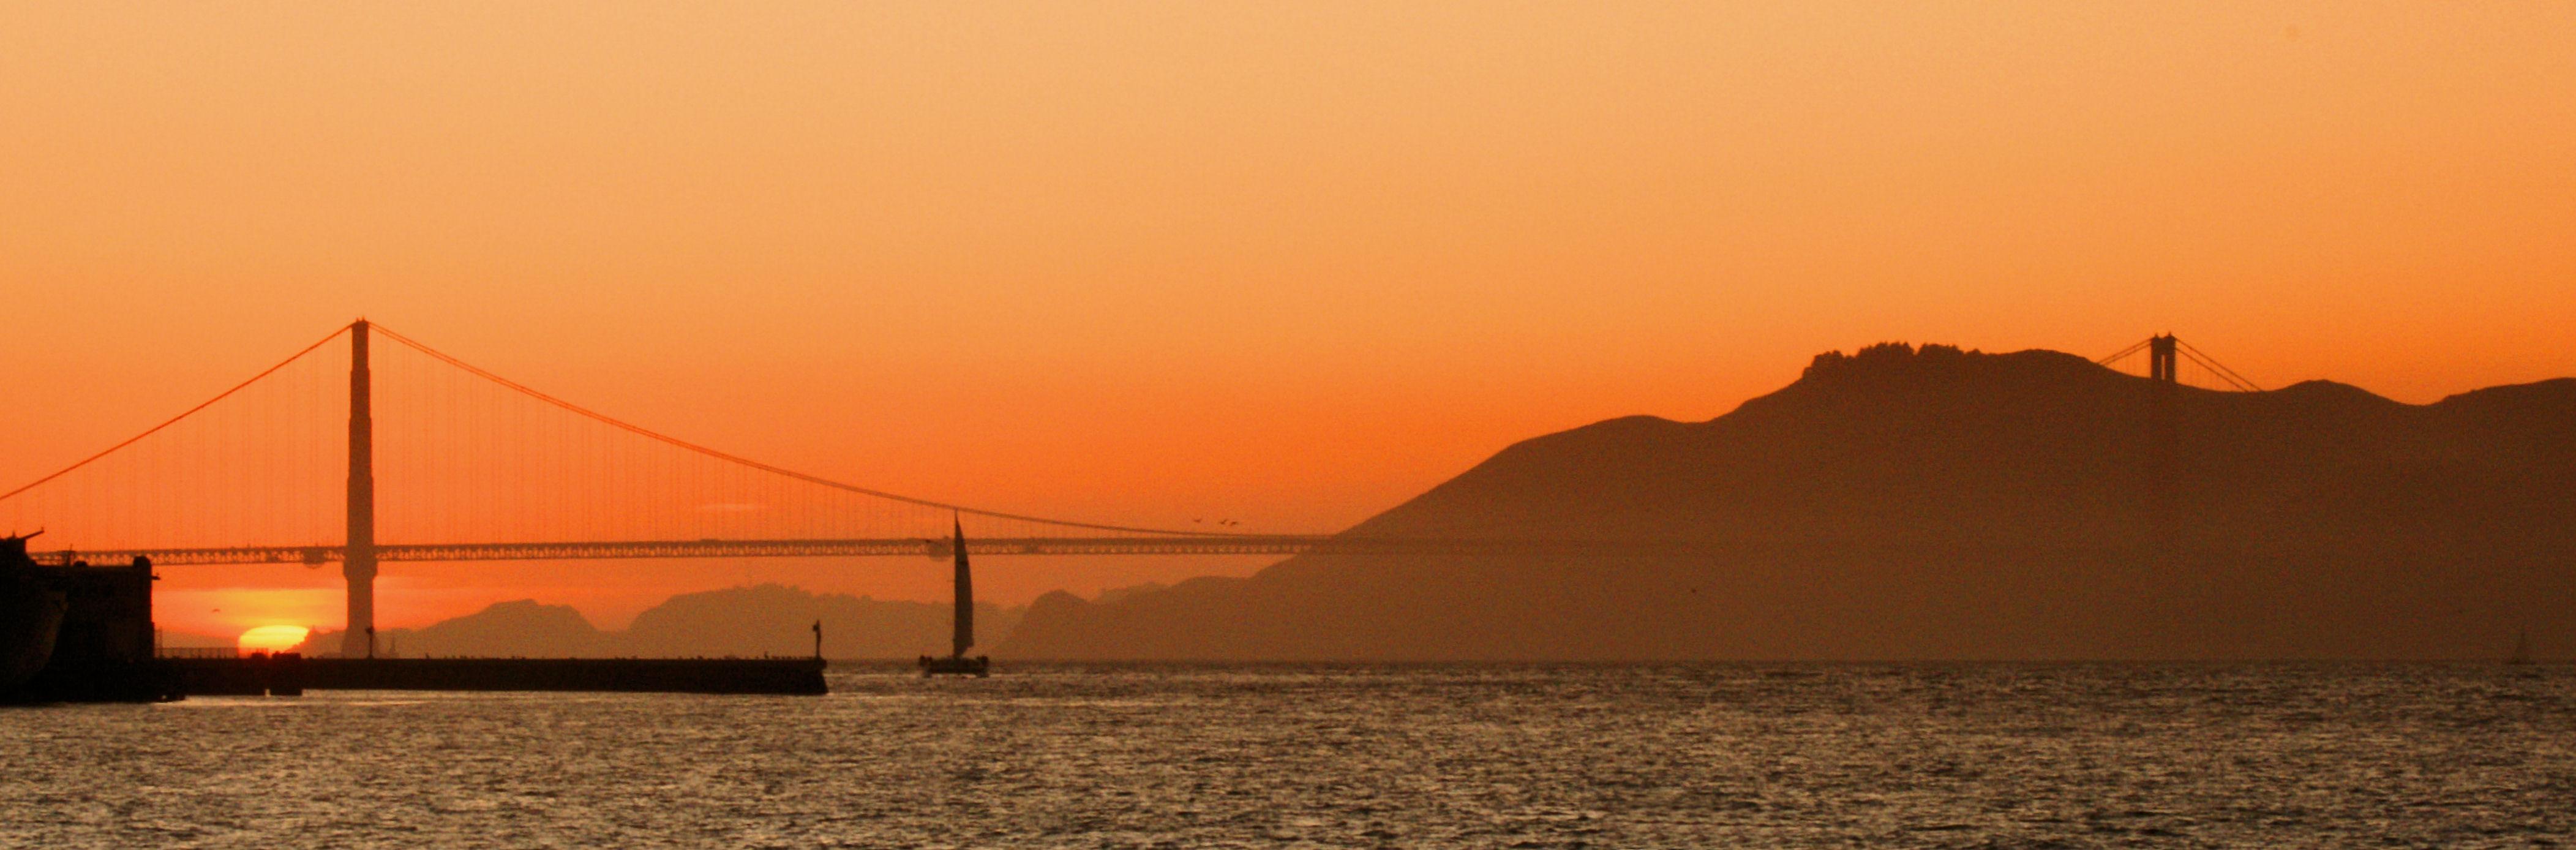 Sunset San Francisco